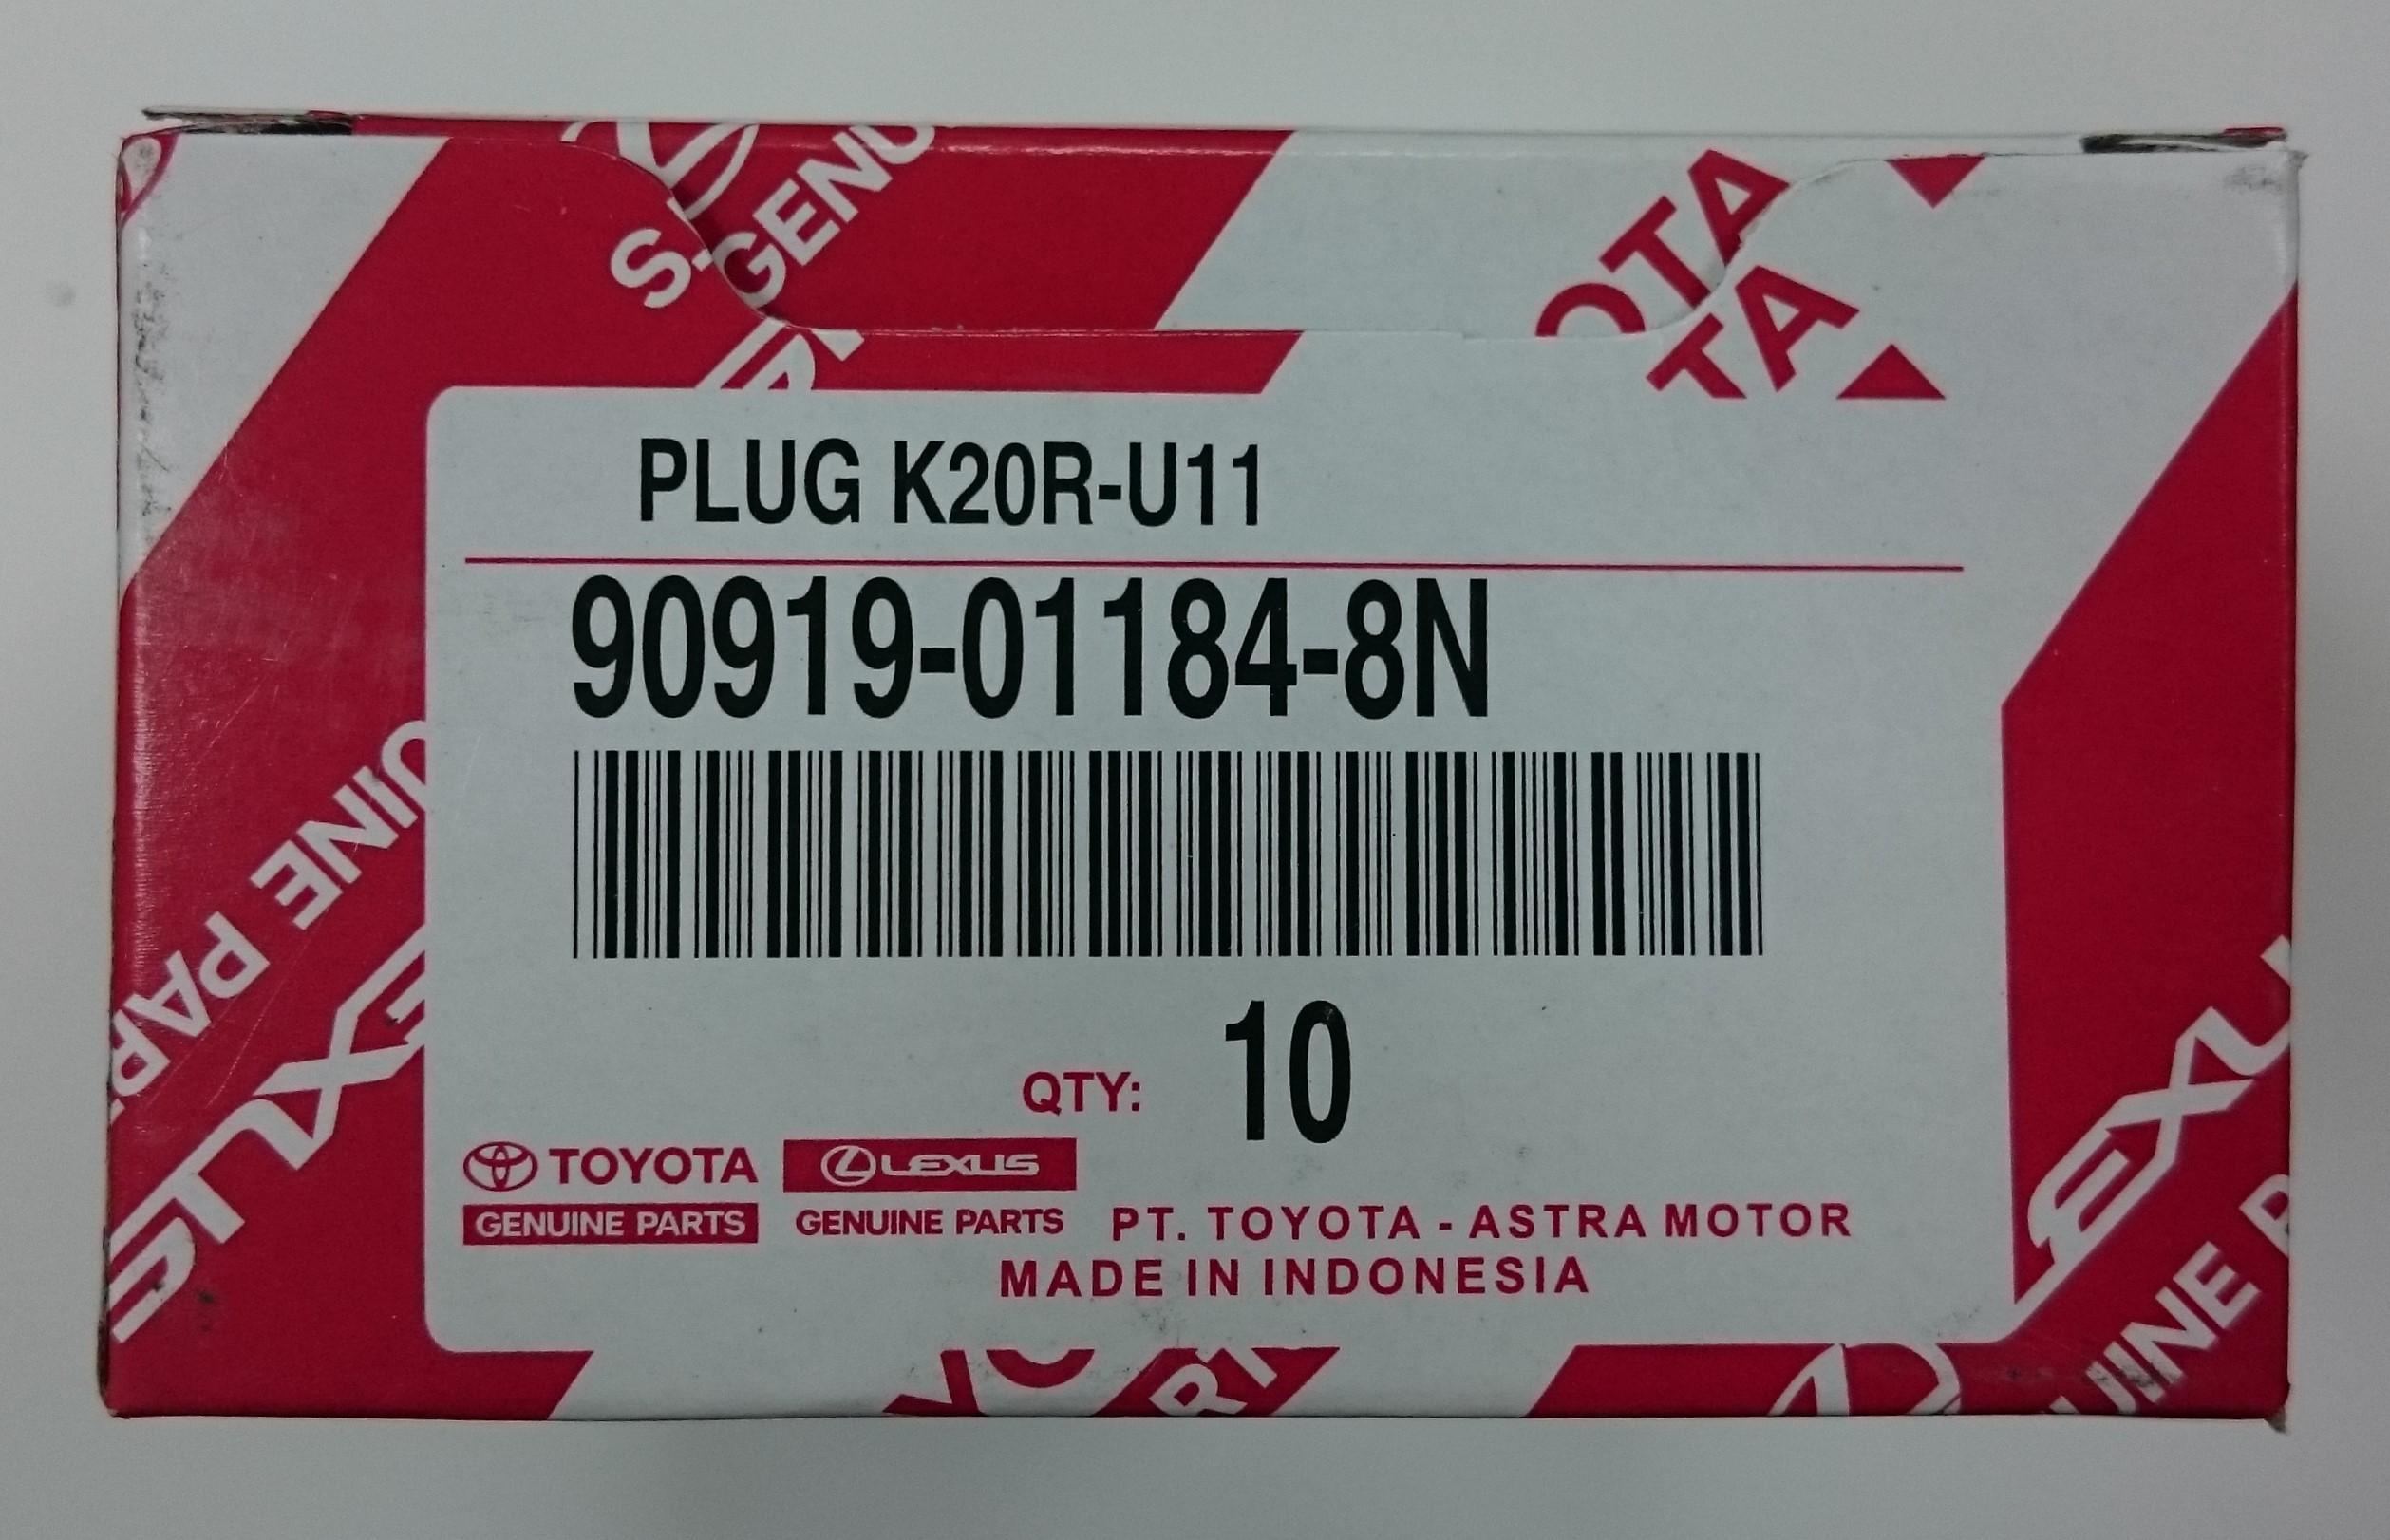 toyota product watermark bold parts genuine genuinepartsthailand